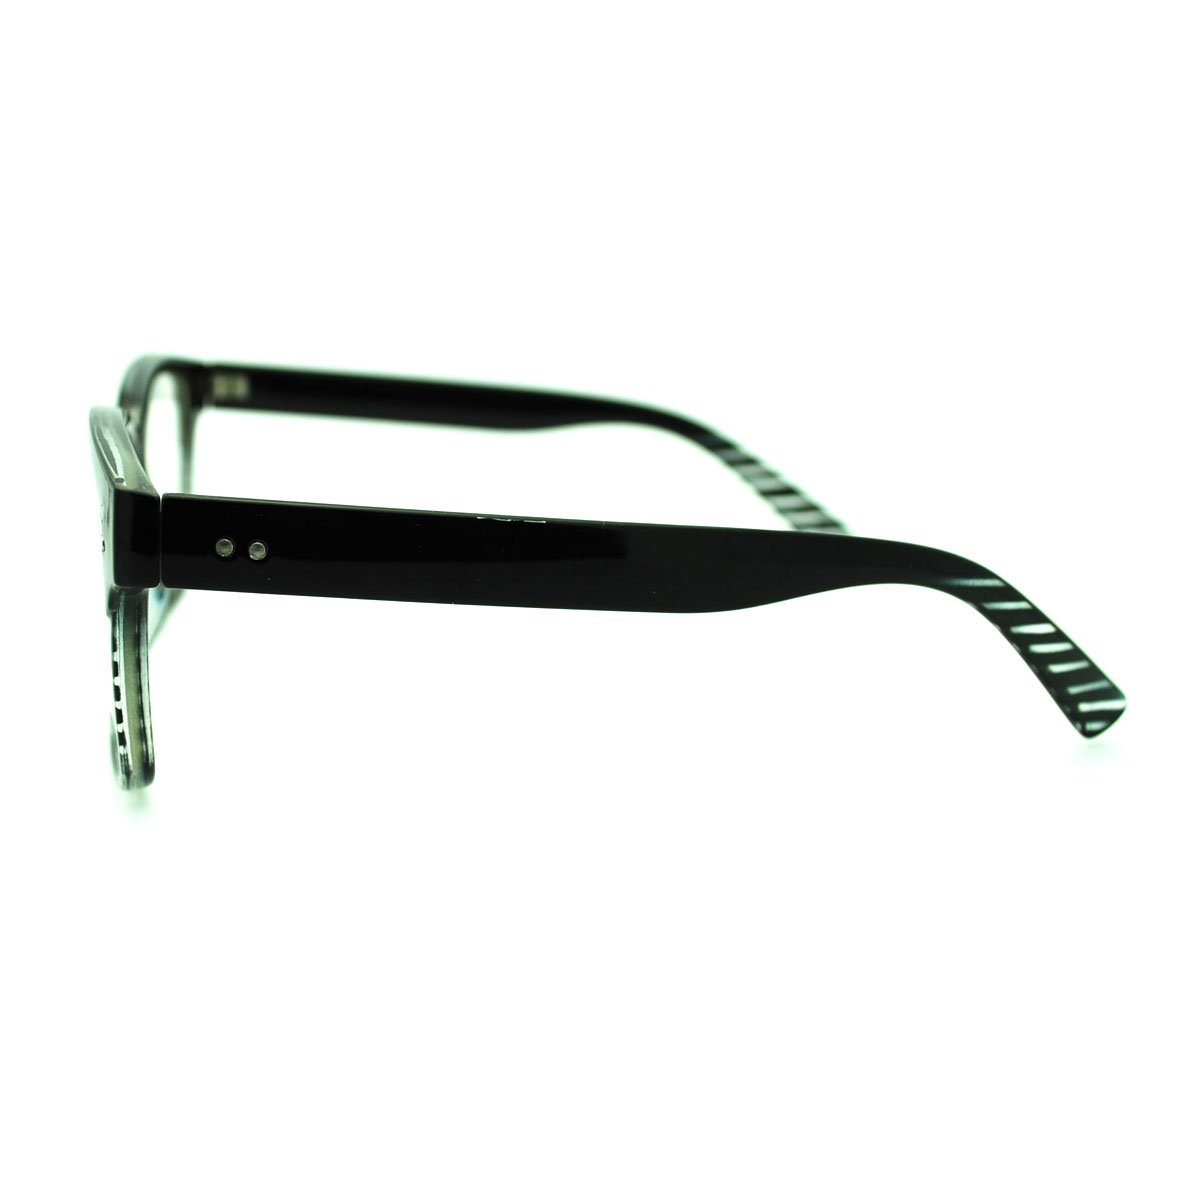 Clear Lens Eyeglasses Square Thin Frame Nerdy Fashion Glasses